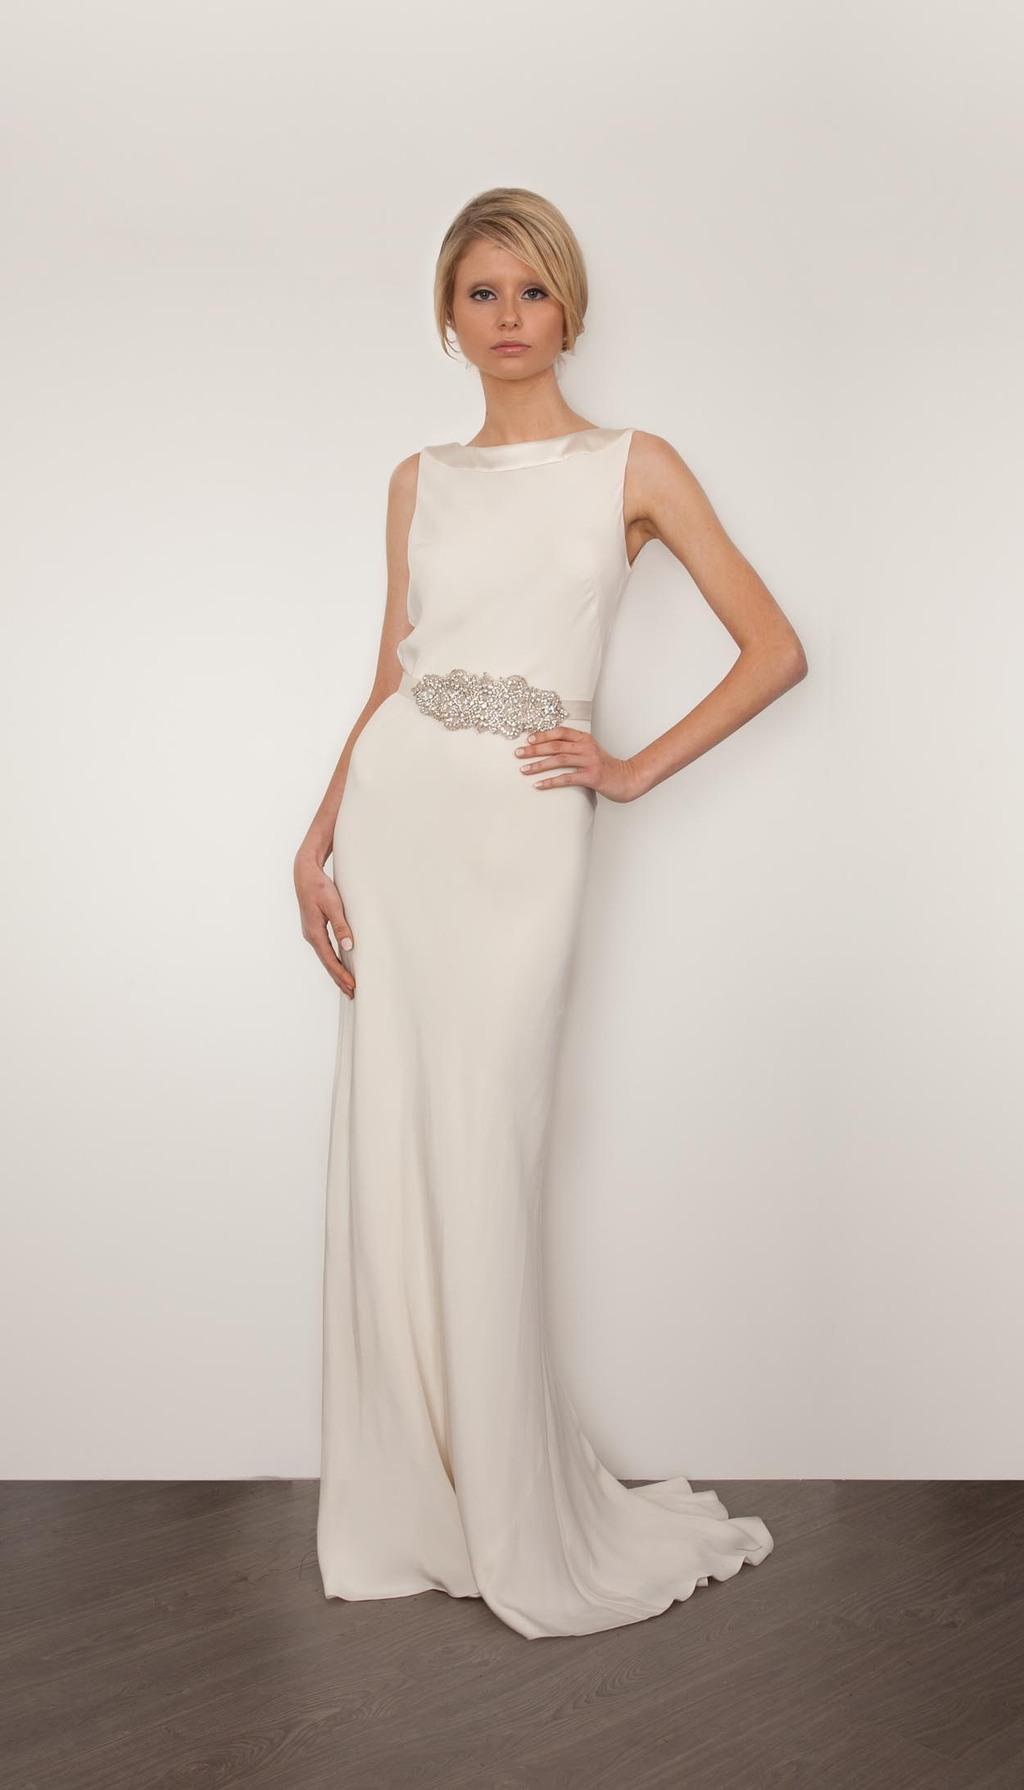 Sarah-janks-wedding-dress-2013-bridal-cassandra.full